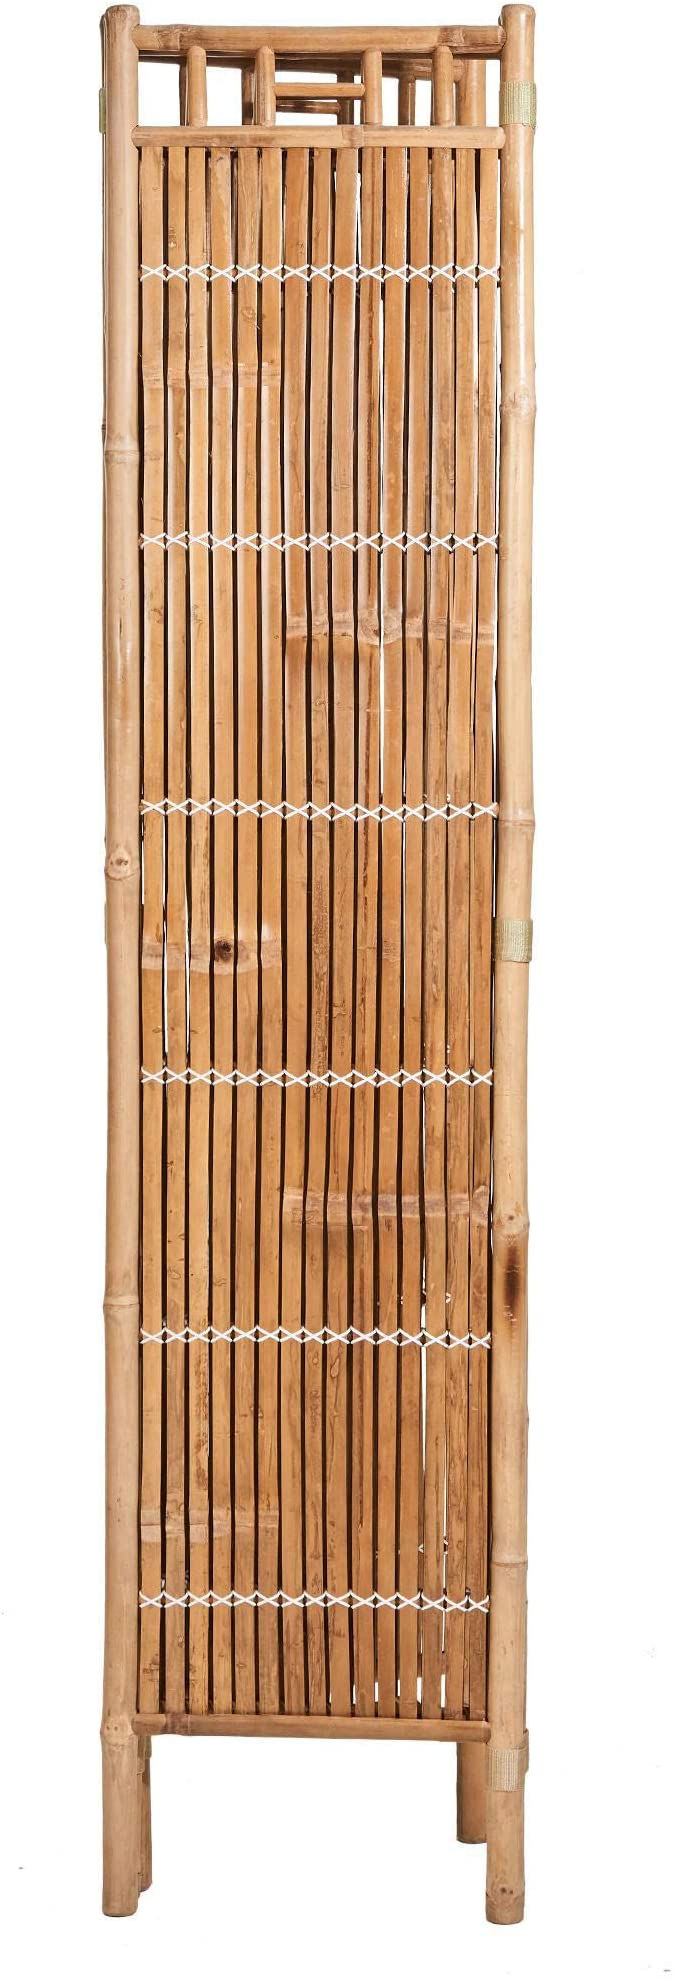 Full Size of Paravent Bambus Balkon Butlers Safari 120x4x180 Cm Brauner Raumteiler Garten Bett Wohnzimmer Paravent Bambus Balkon